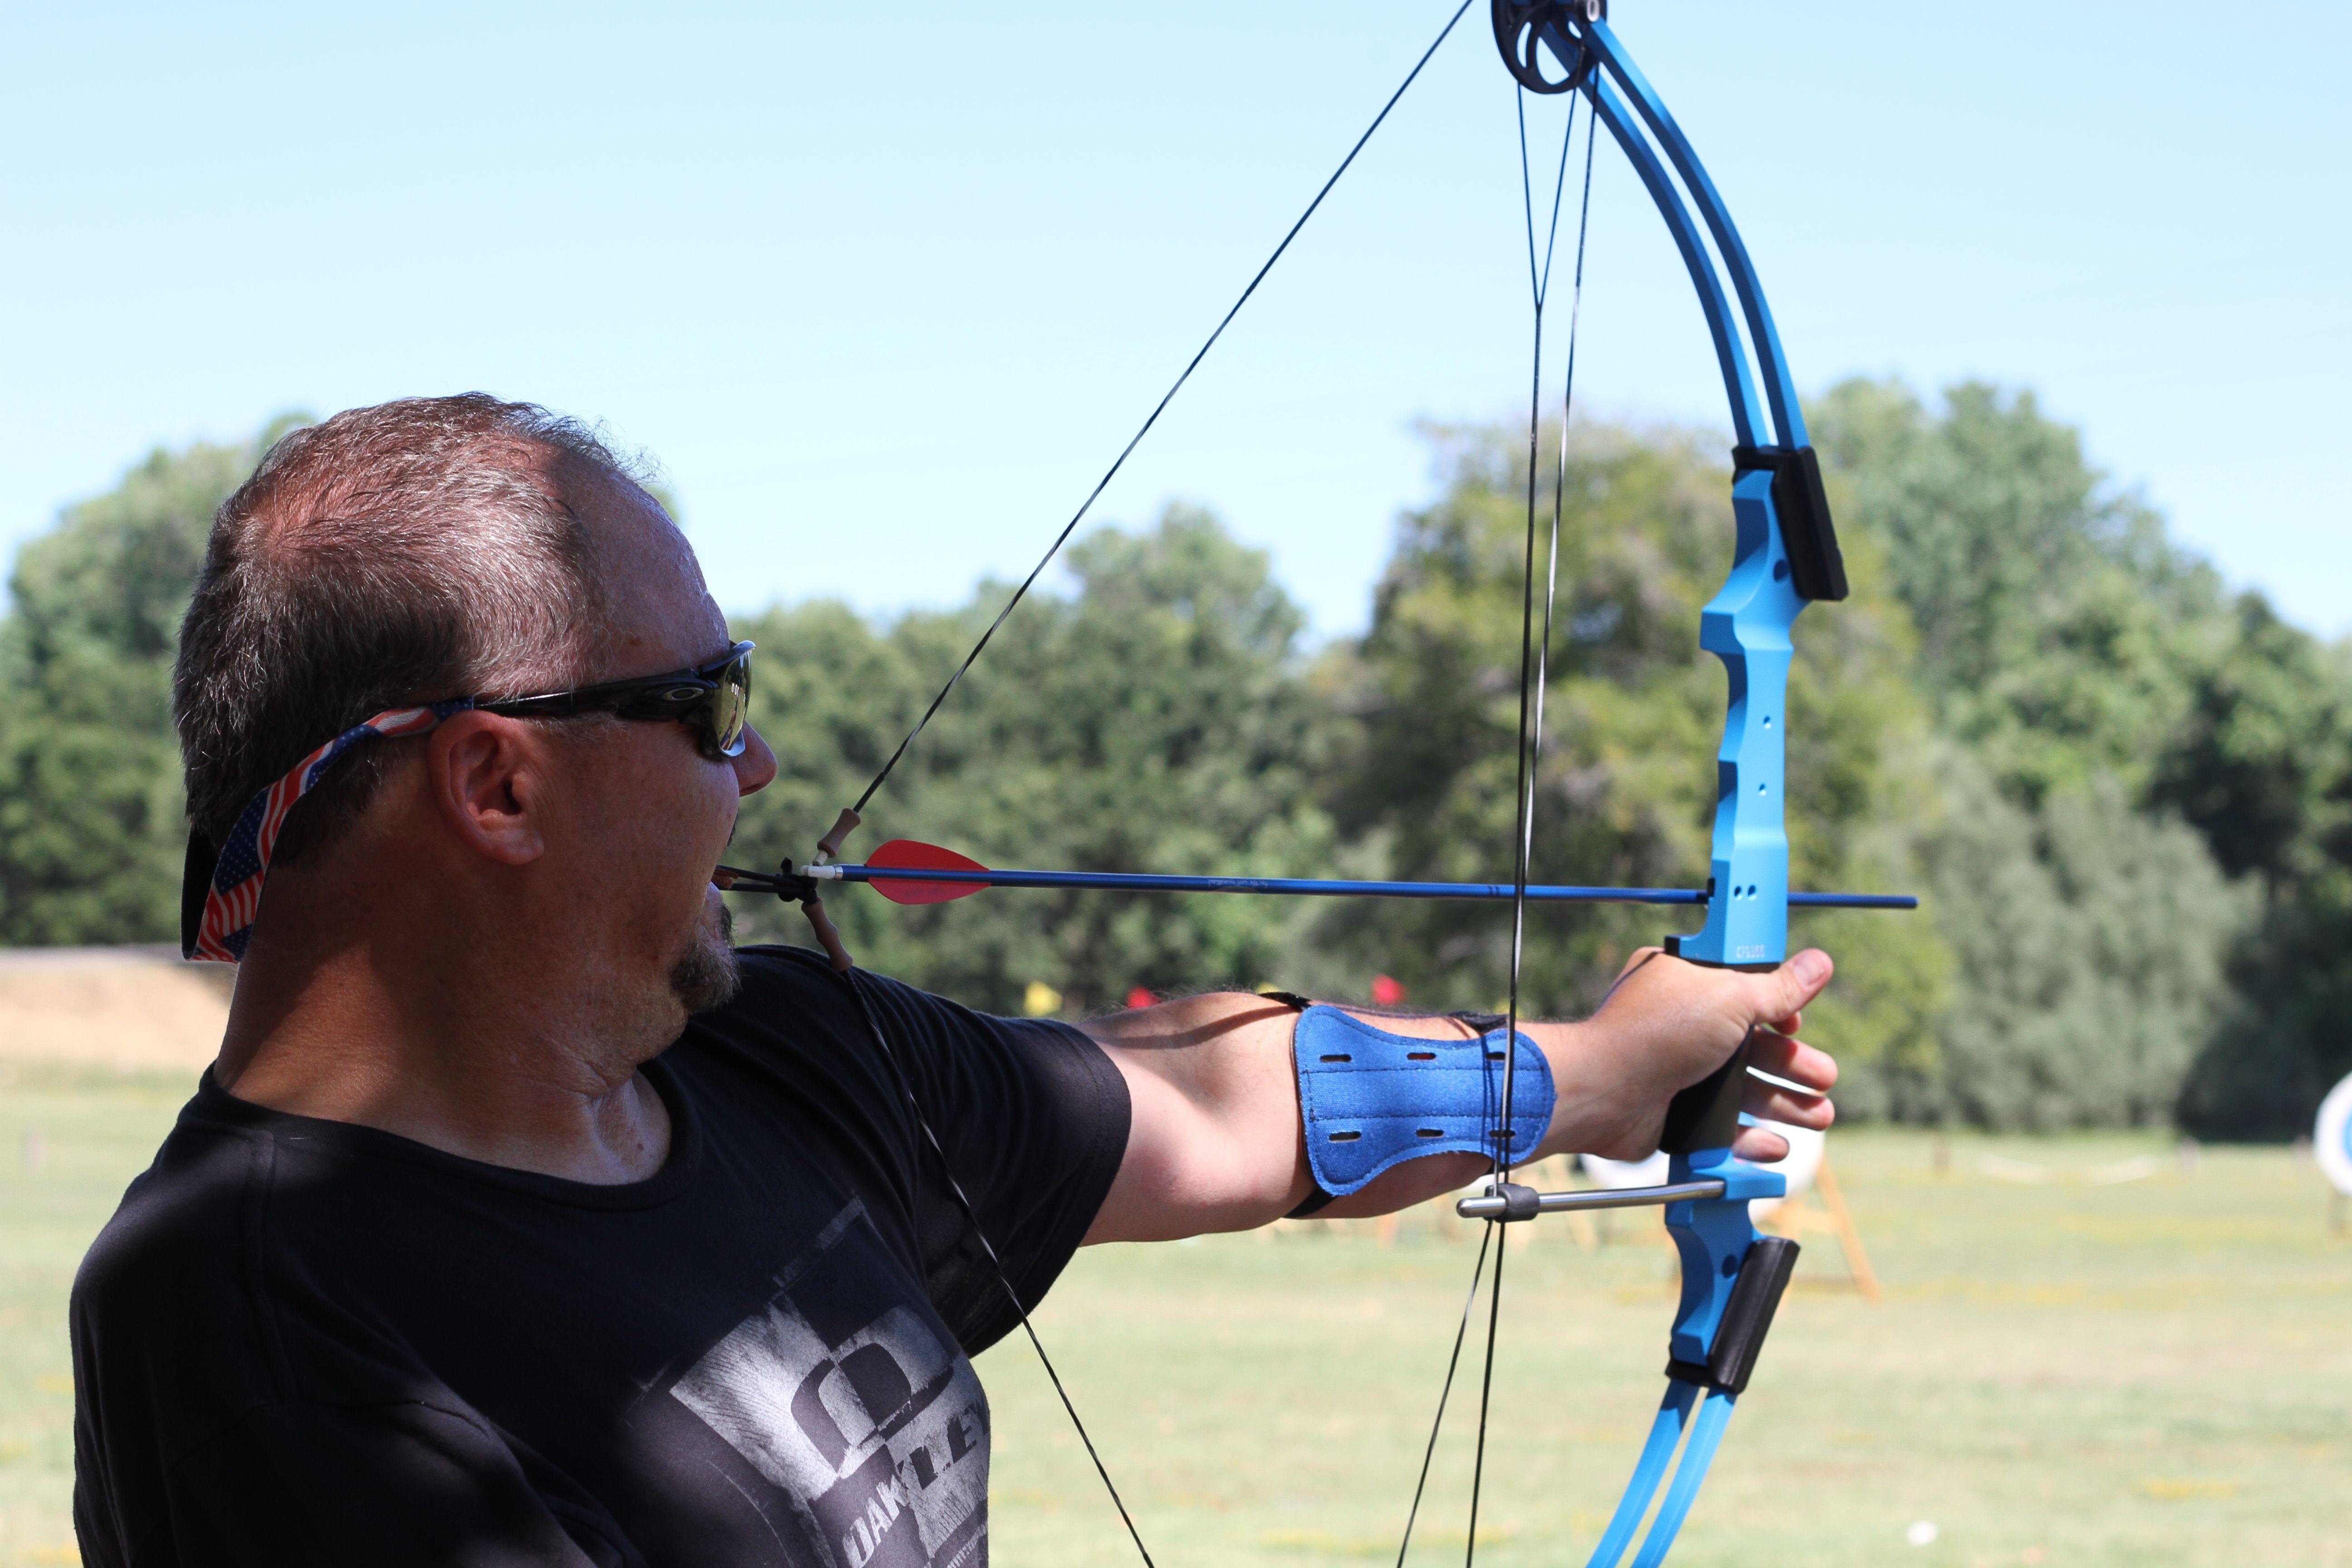 Adaptive archery at Military Summer Sport Camp. Summer